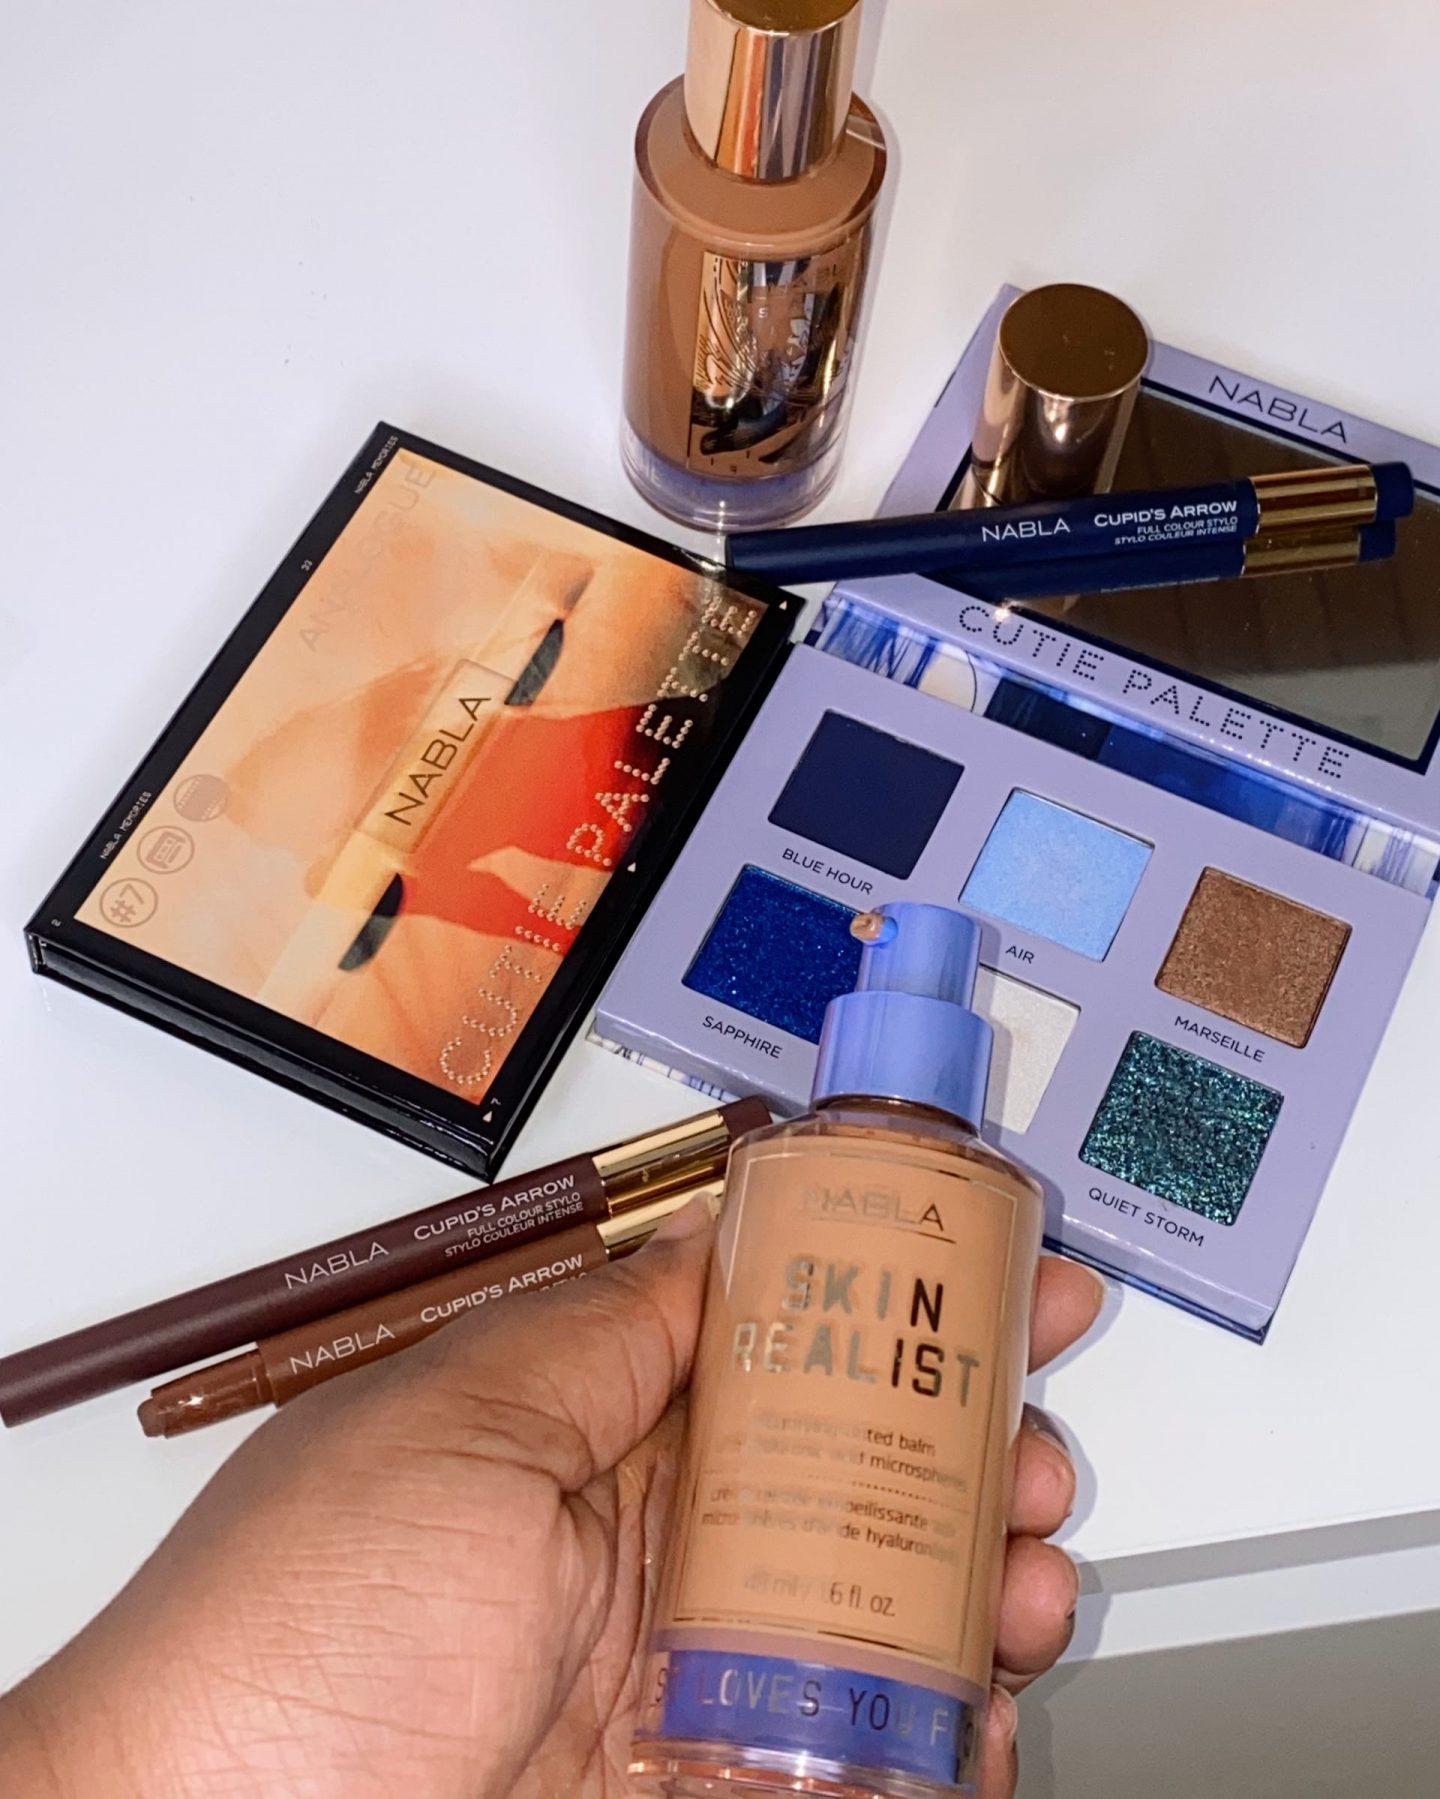 Nabla Skin Realist Tinted Balm & Cutie Collection 2021